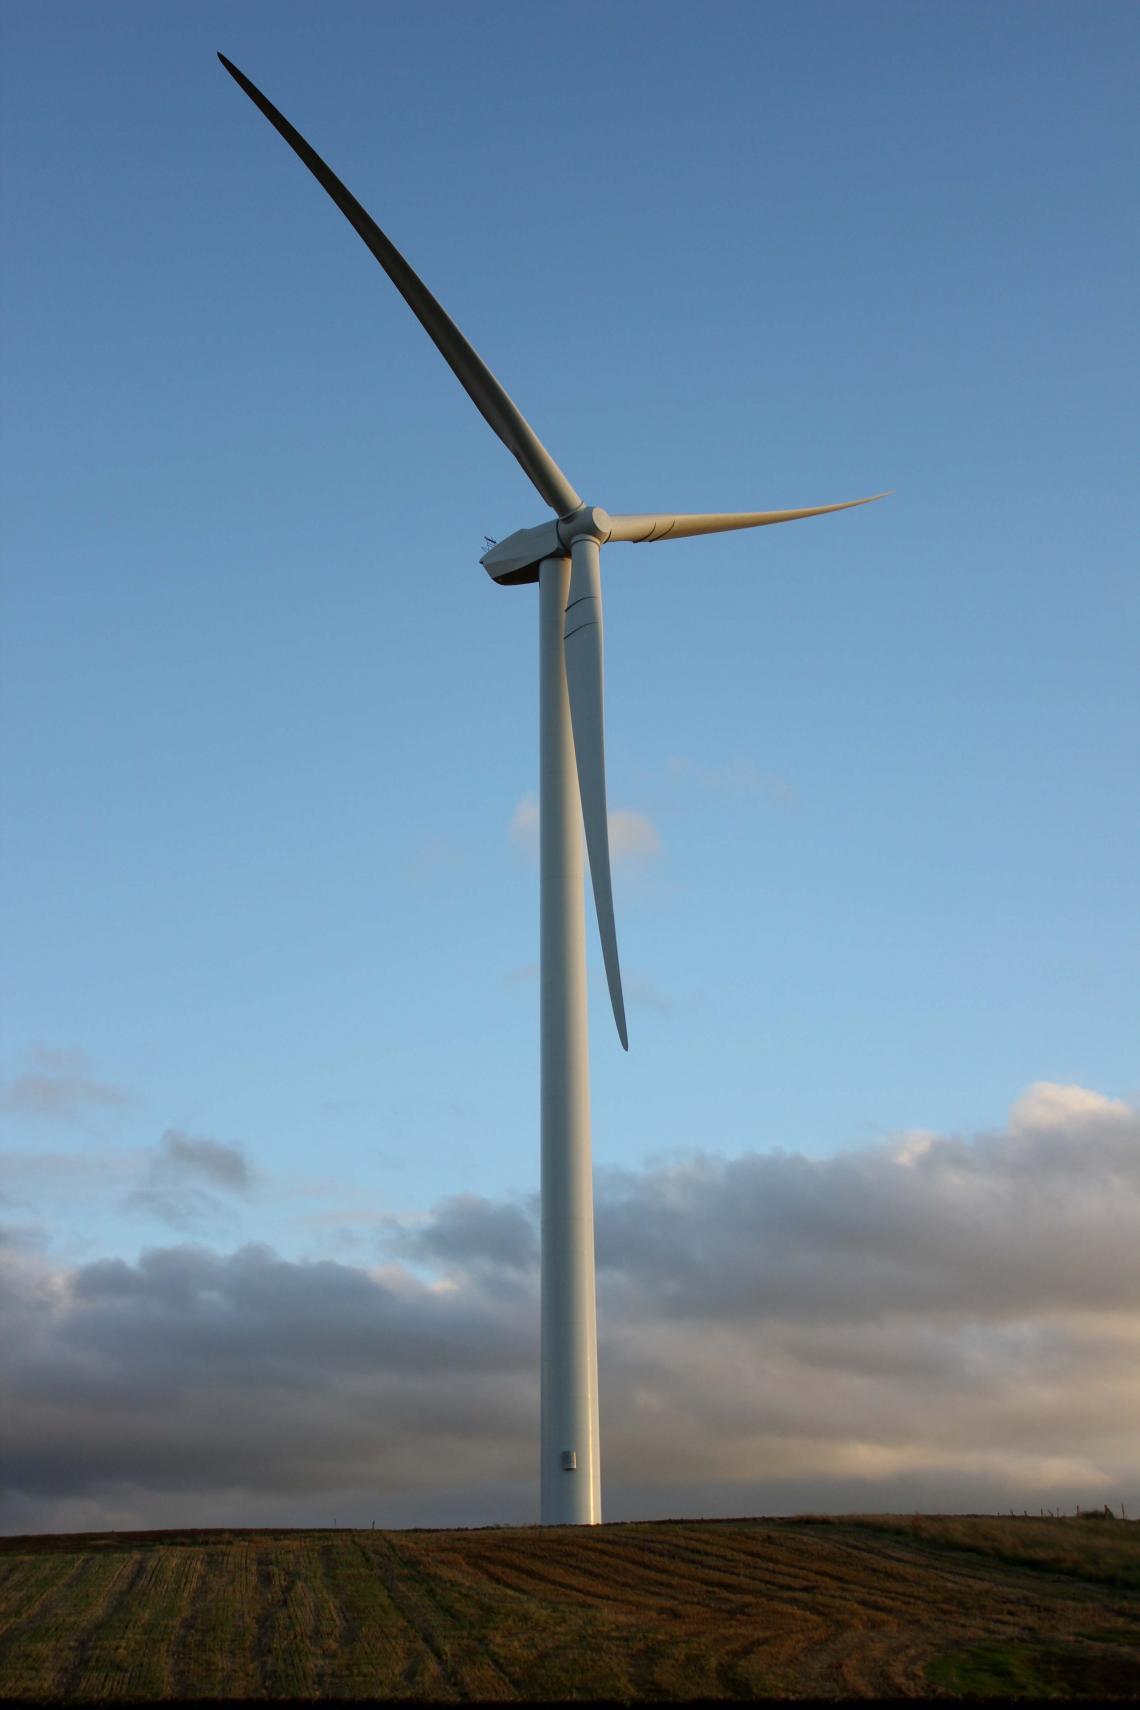 Establishment of Eolian Three and Acquisition of Peattie Wind Farm